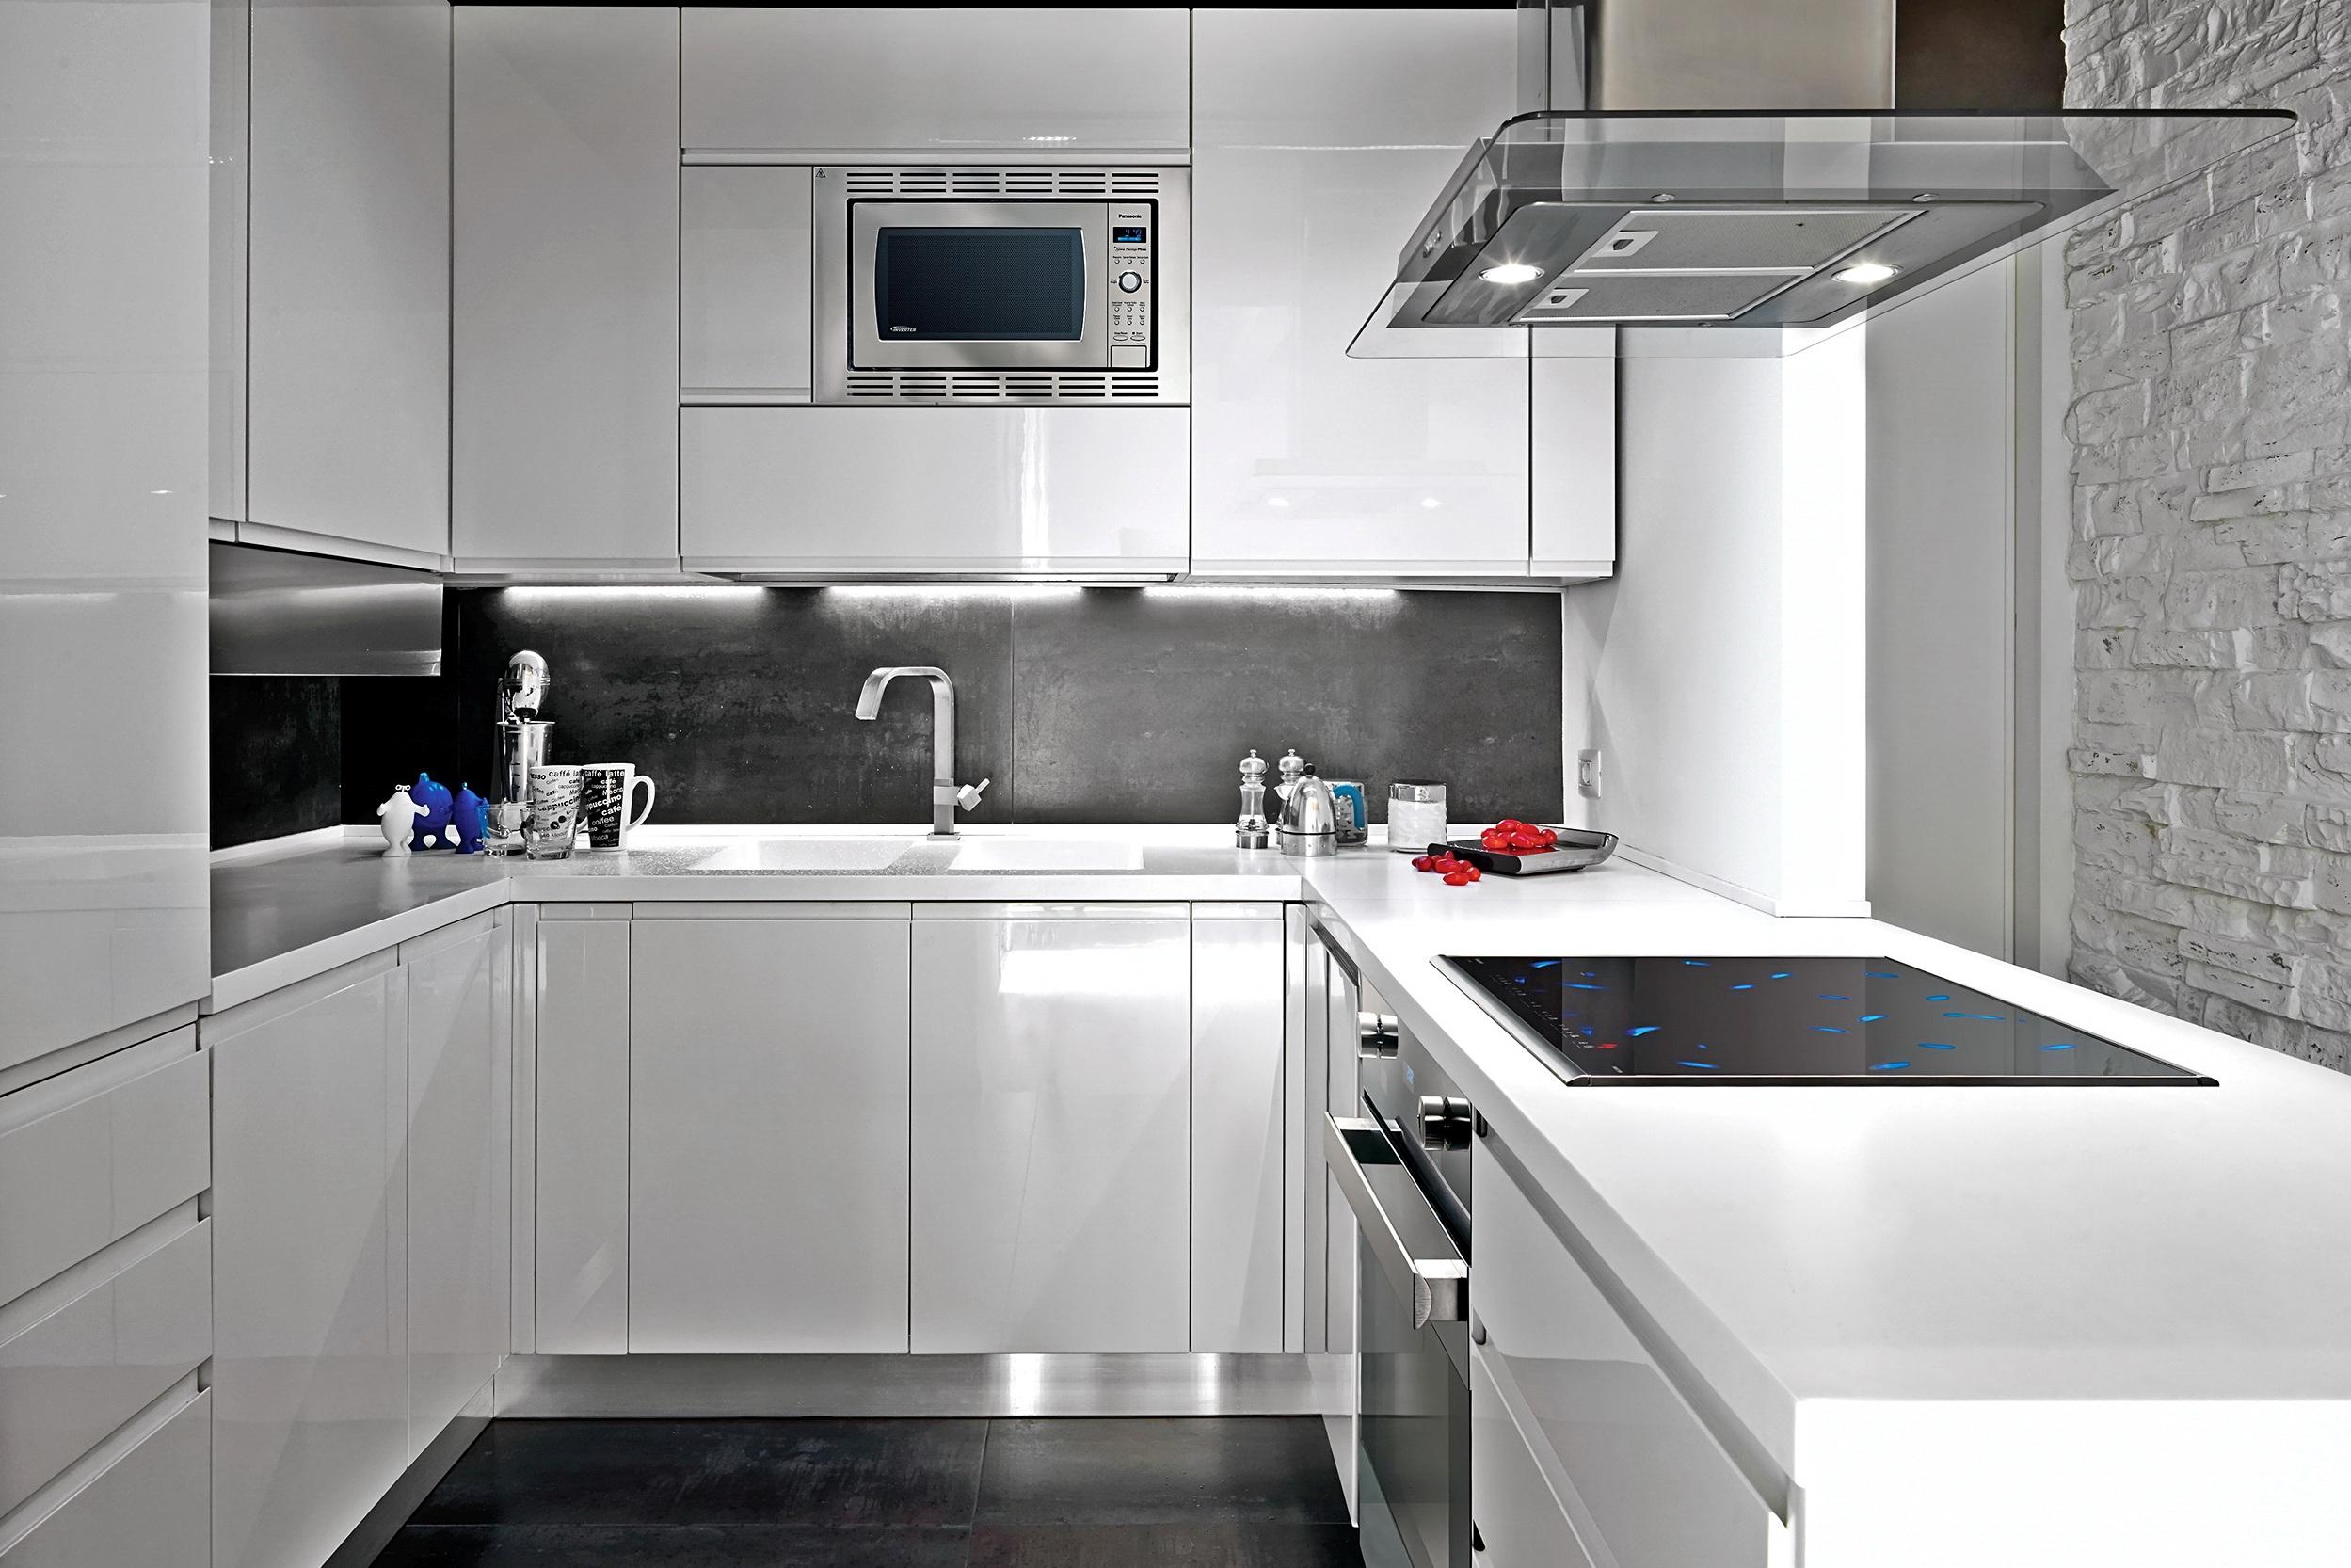 belaja gljancevaja kuhnja - Интерьер кухни в белом цвете